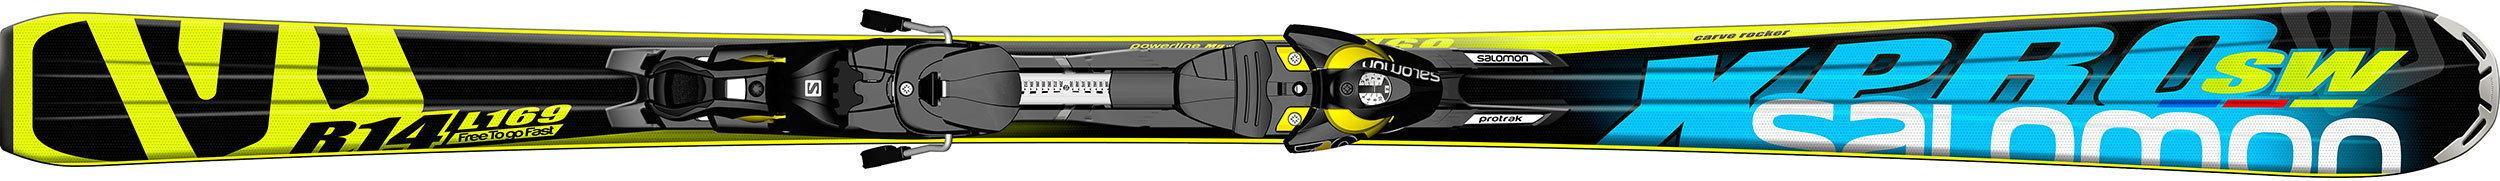 Salomon X-Pro SW 2015